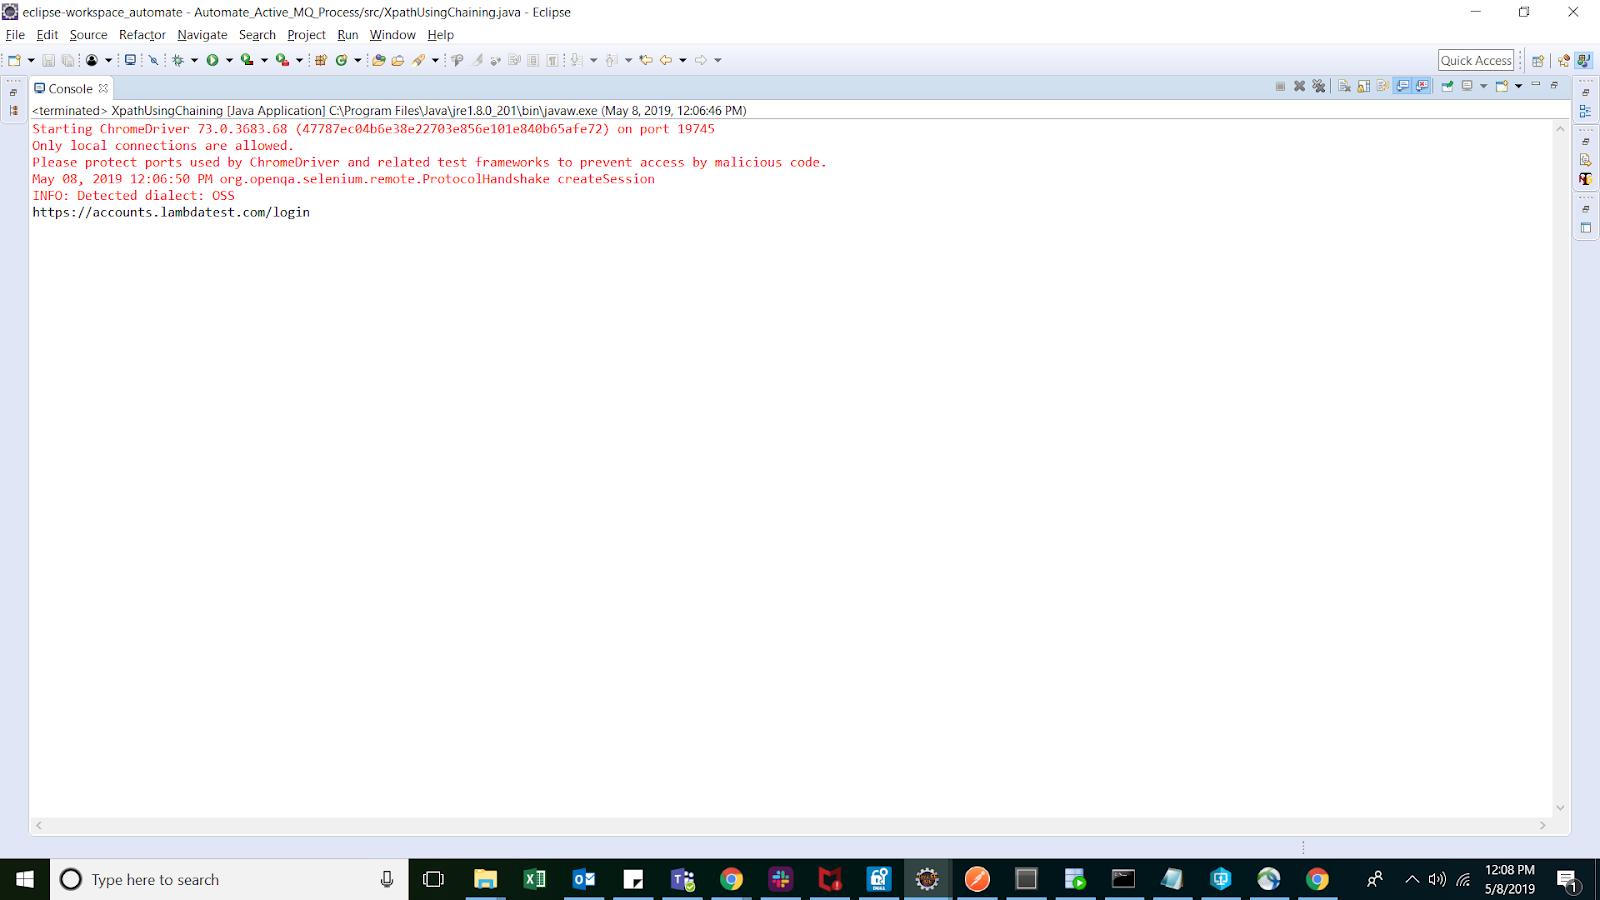 XPath example in Selenium